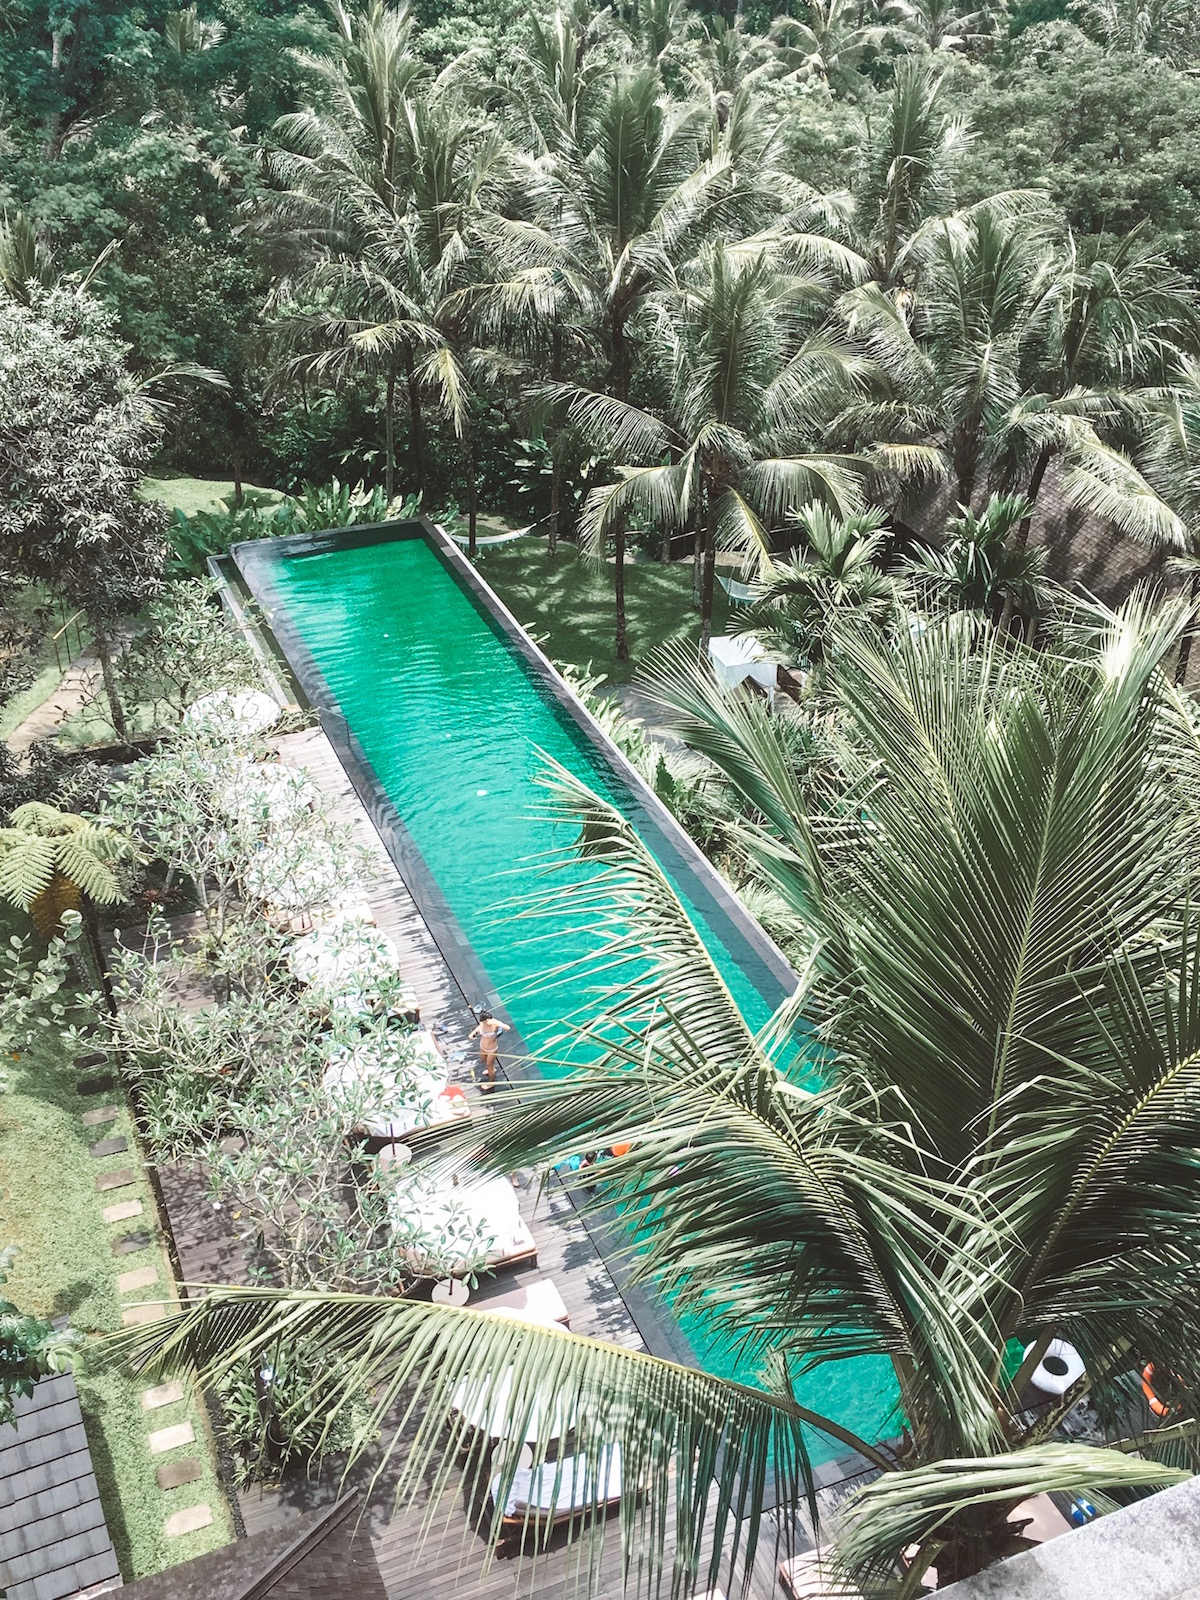 Balinese tourism vs Caribbean tourism